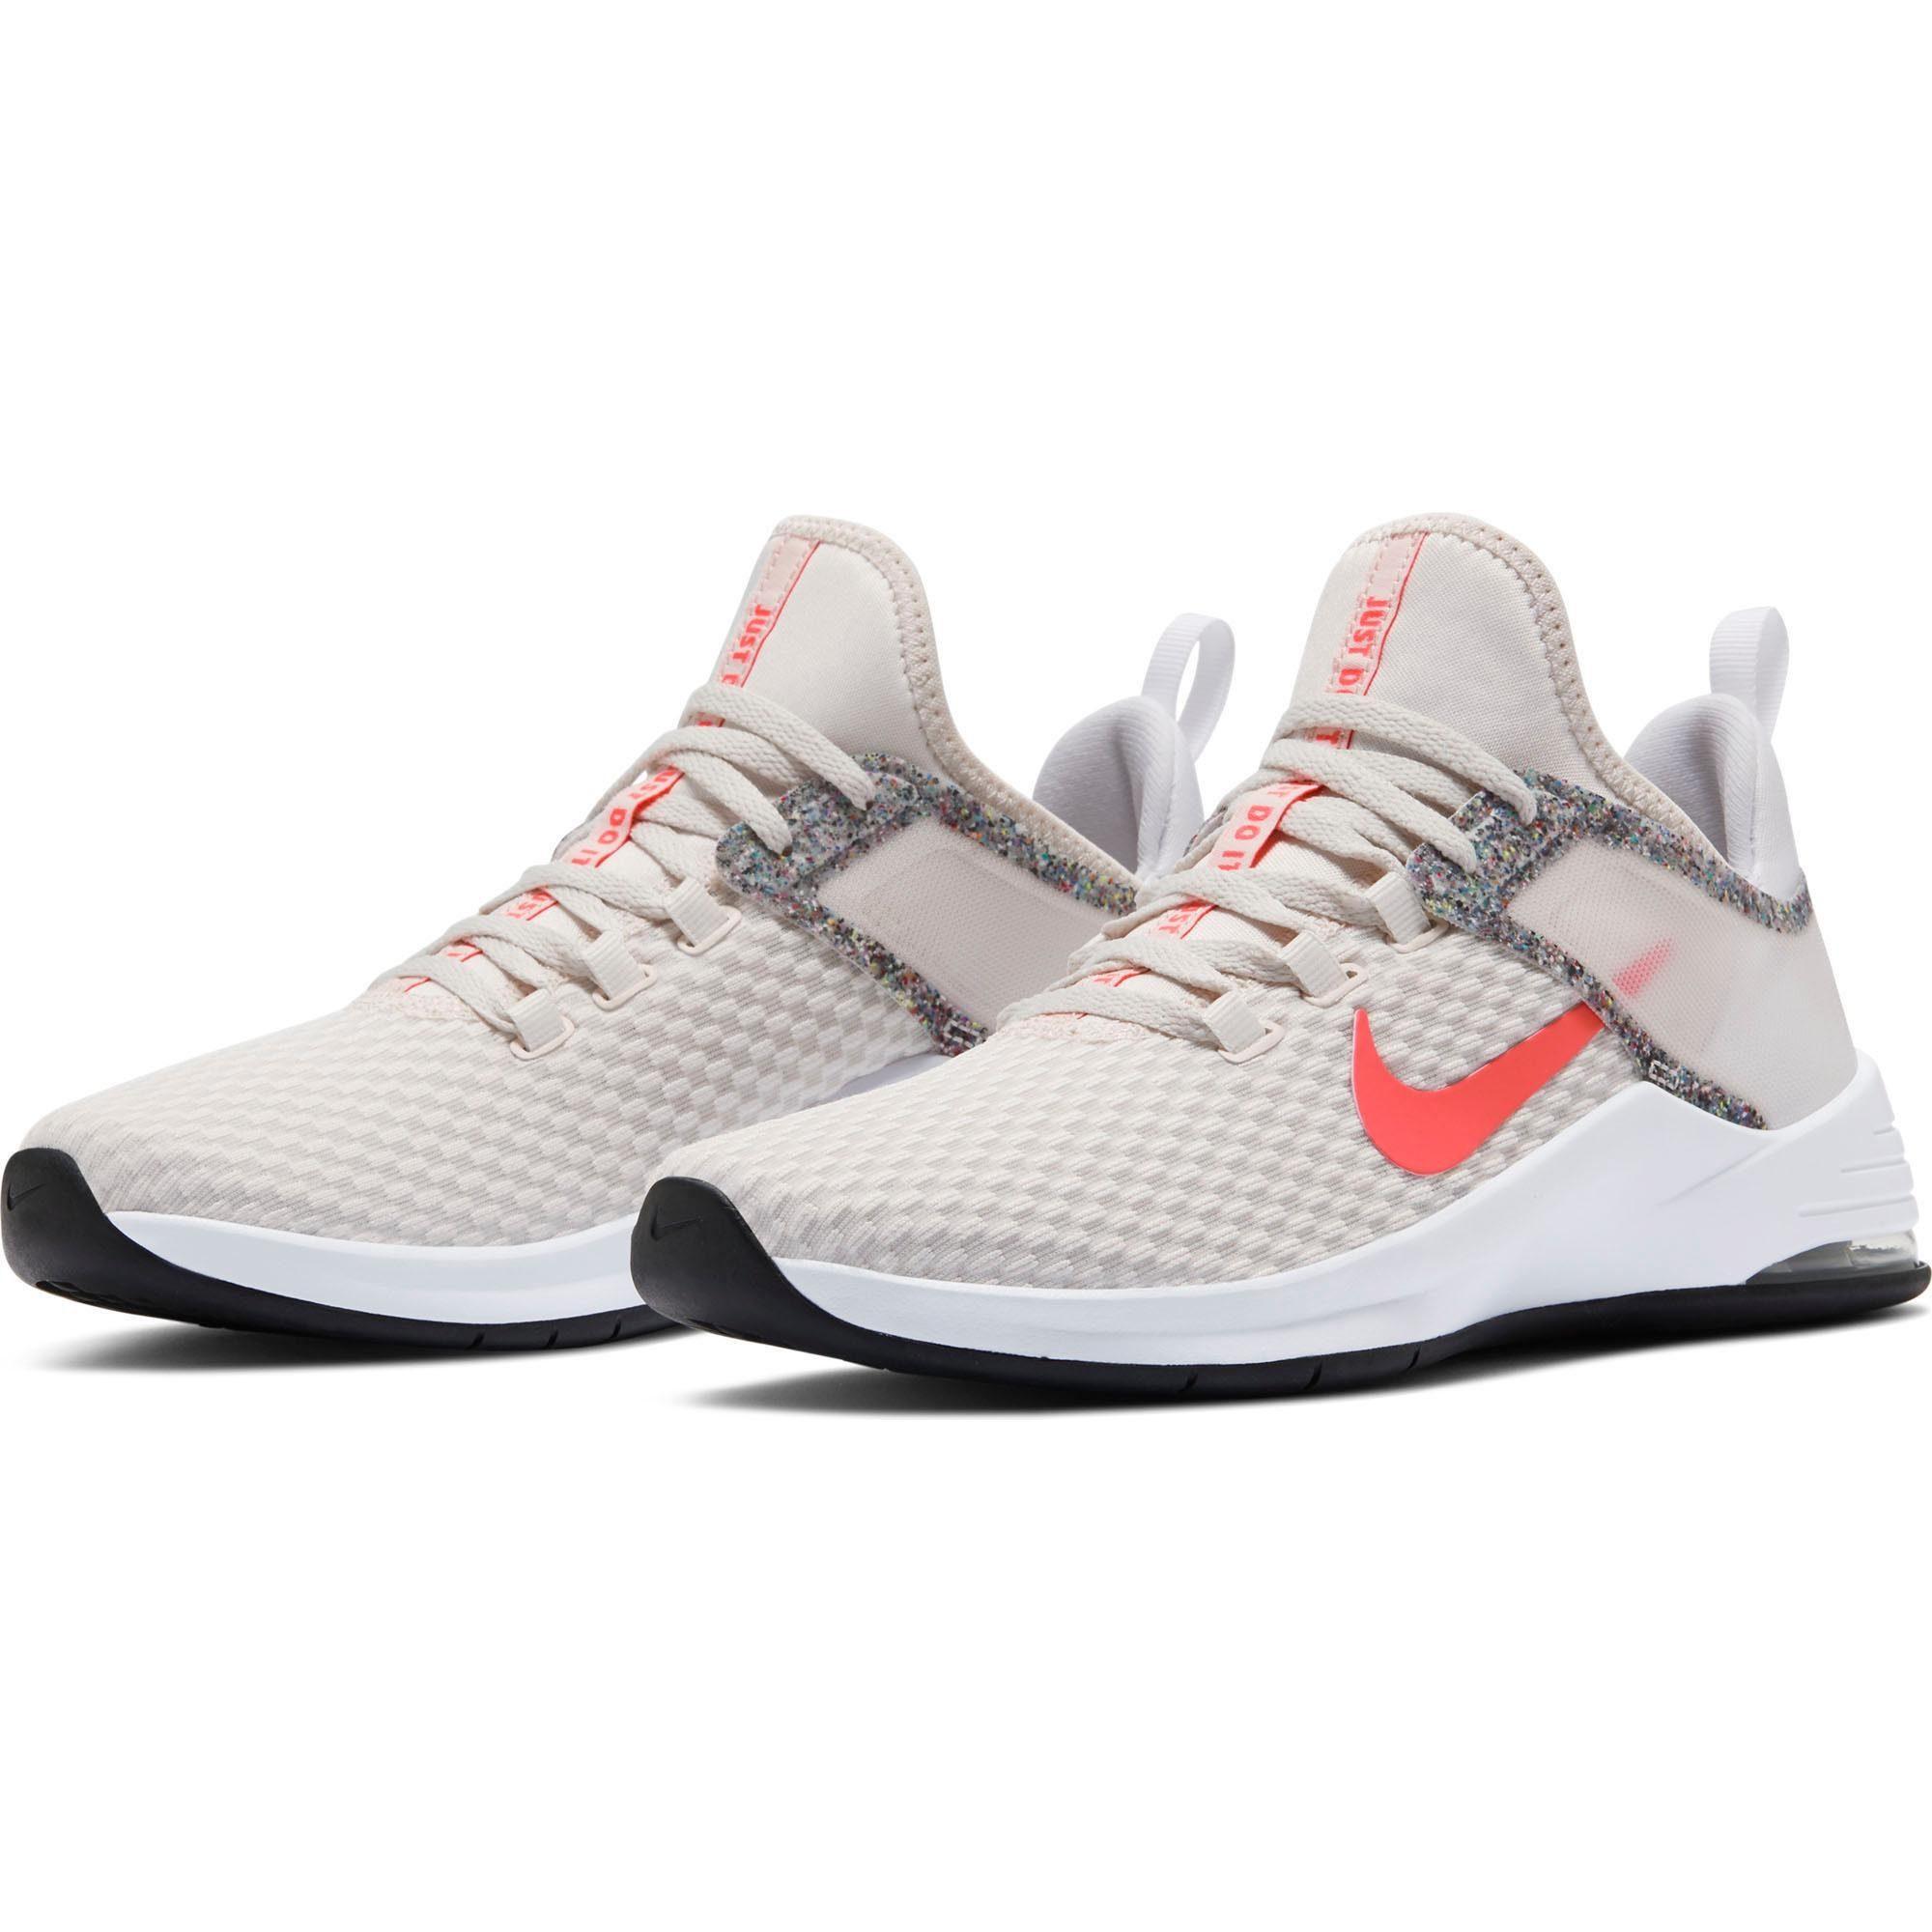 Nike »Wmns Air Max Bella Tr 2« Fitnessschuh kaufen | OTTO